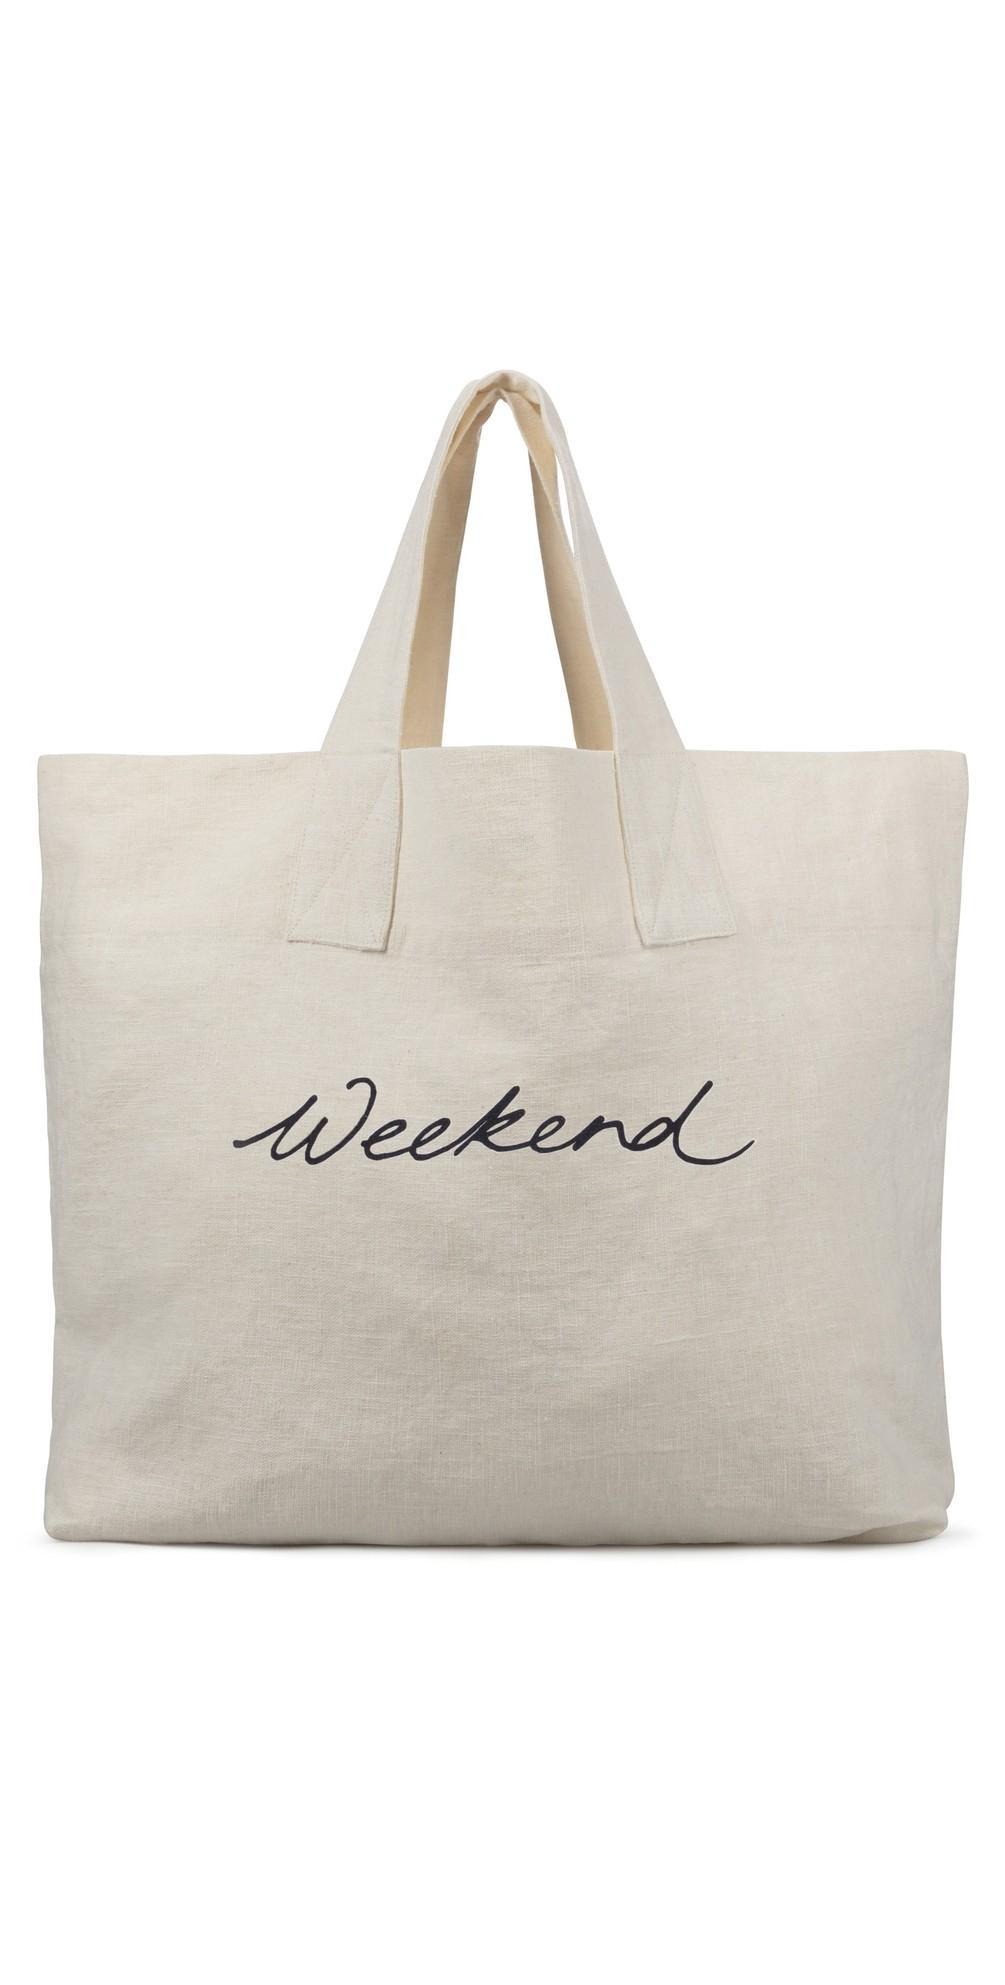 Weekend Shopper main image